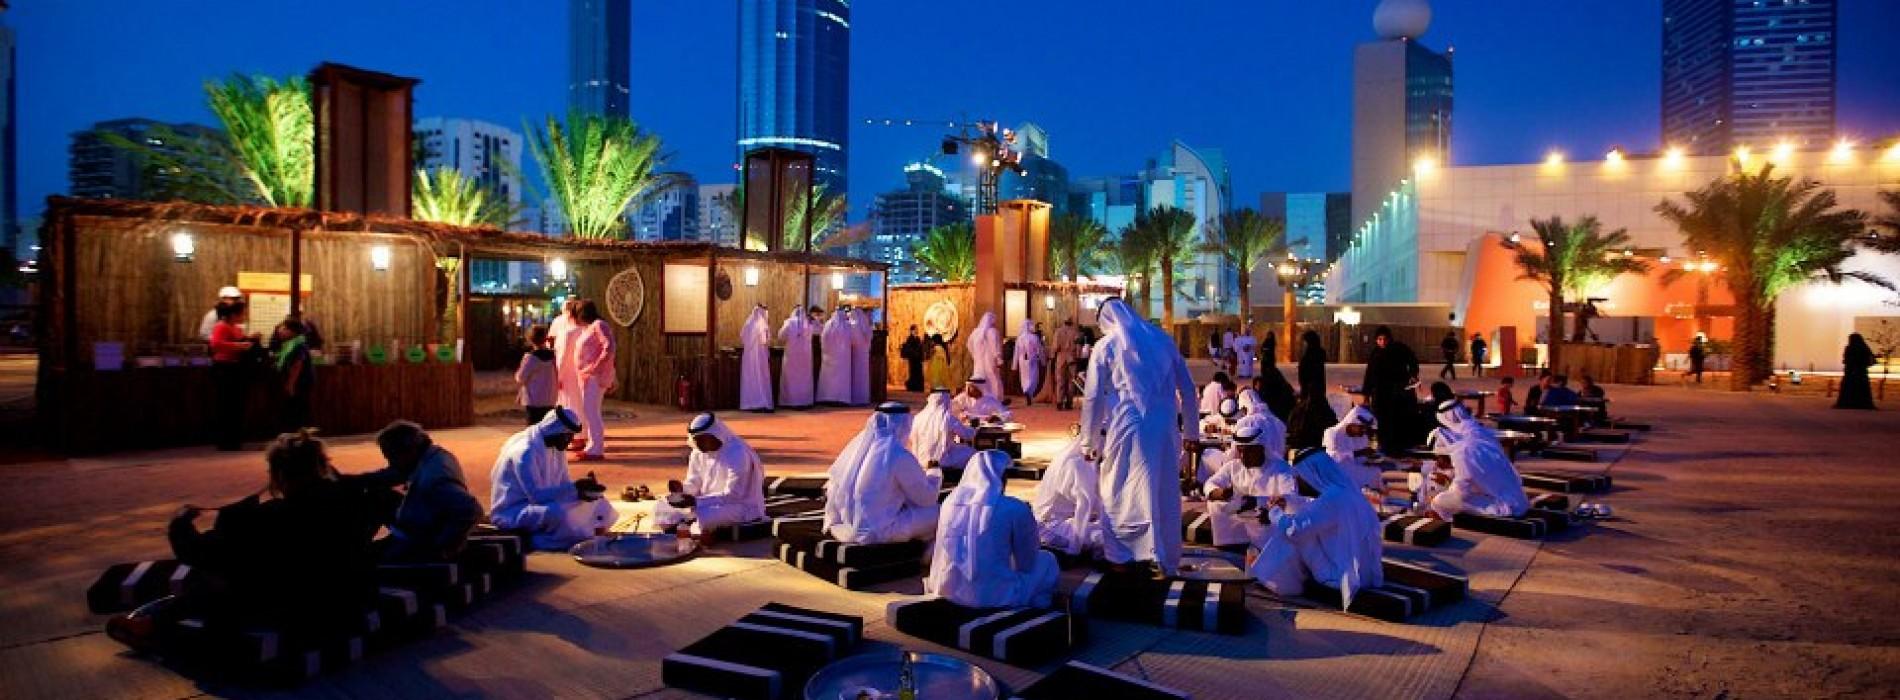 Qasr Al Hosn Festival to Celebrate Emirati Culture and History in February 2015